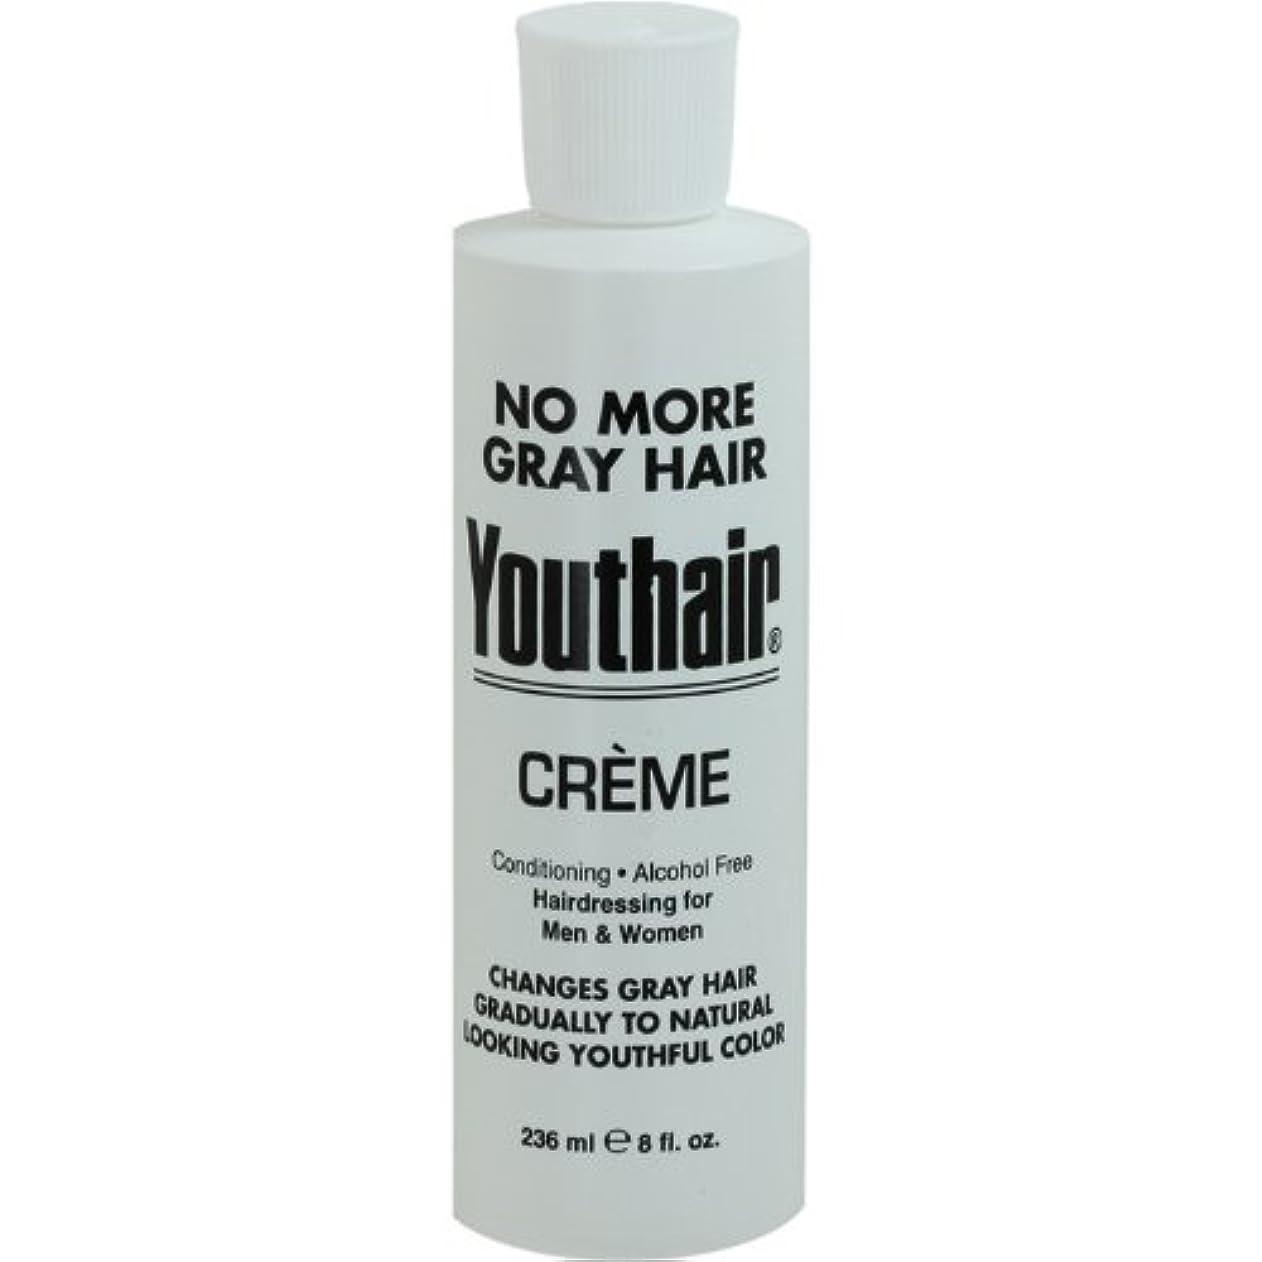 群集承認式Youthair Creme, Round Bottle, 8 Ounce by Youthair